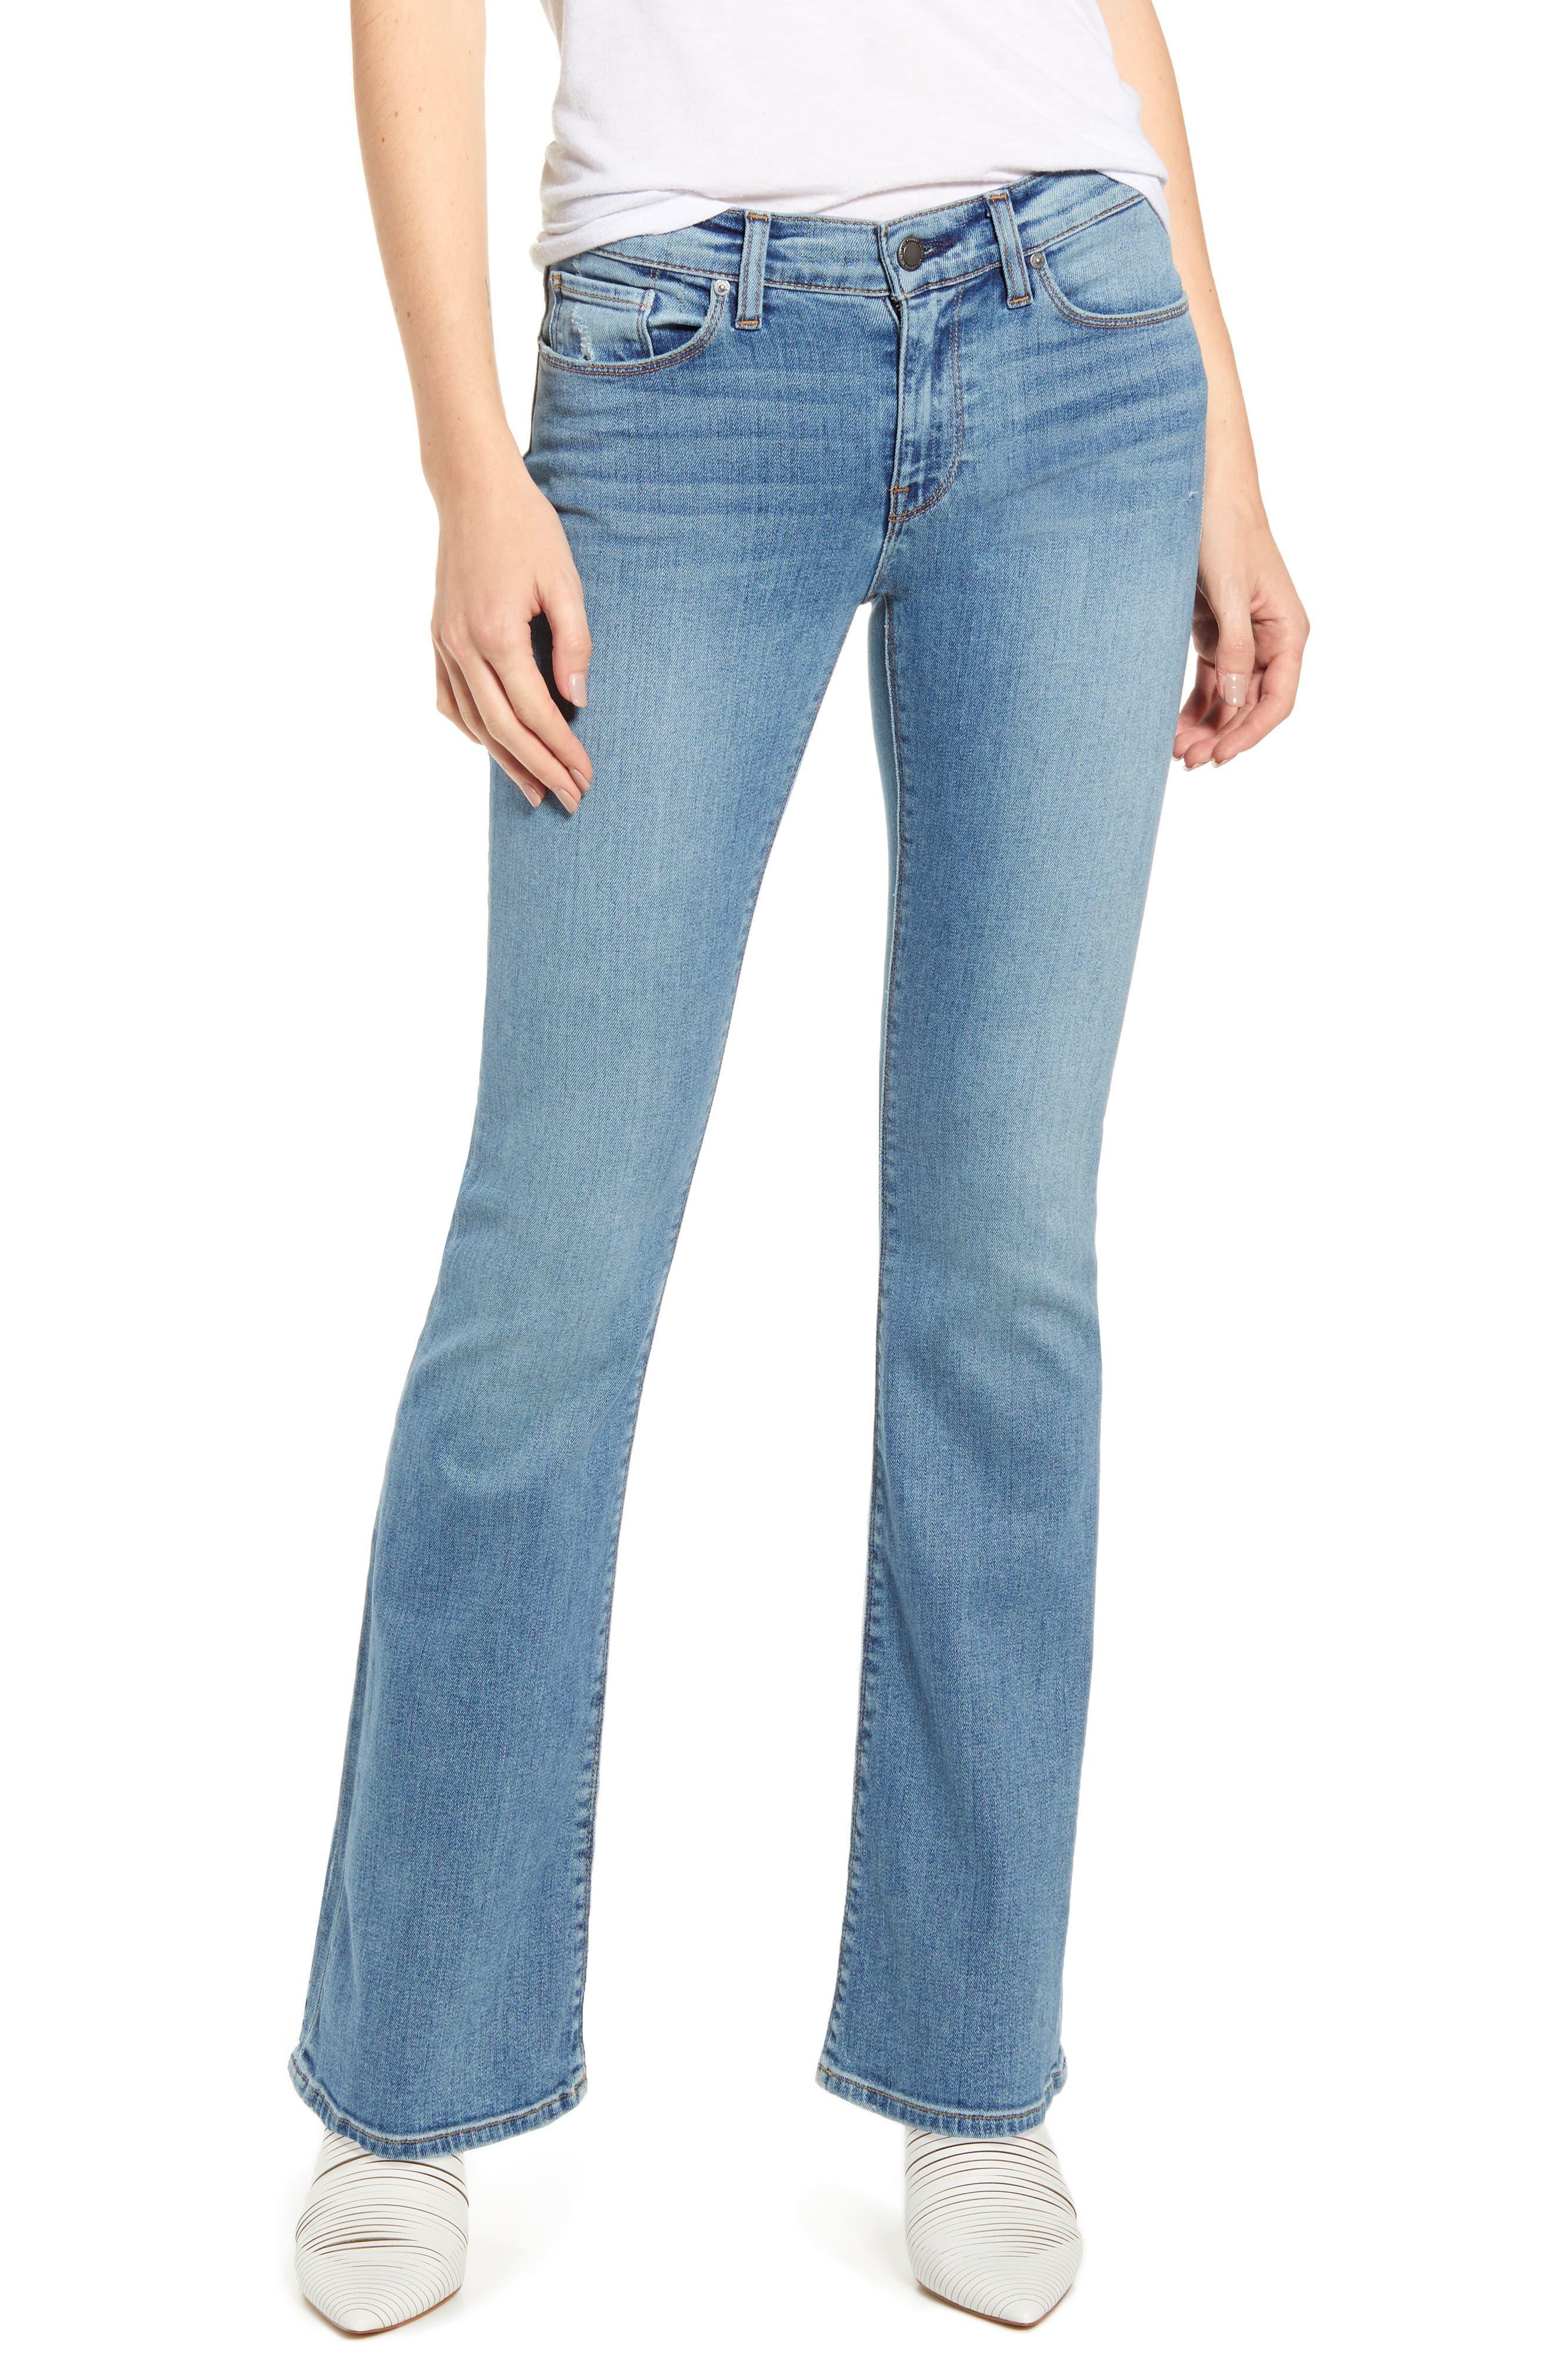 Petite Women's Hudson Jeans Drew Bootcut Jeans